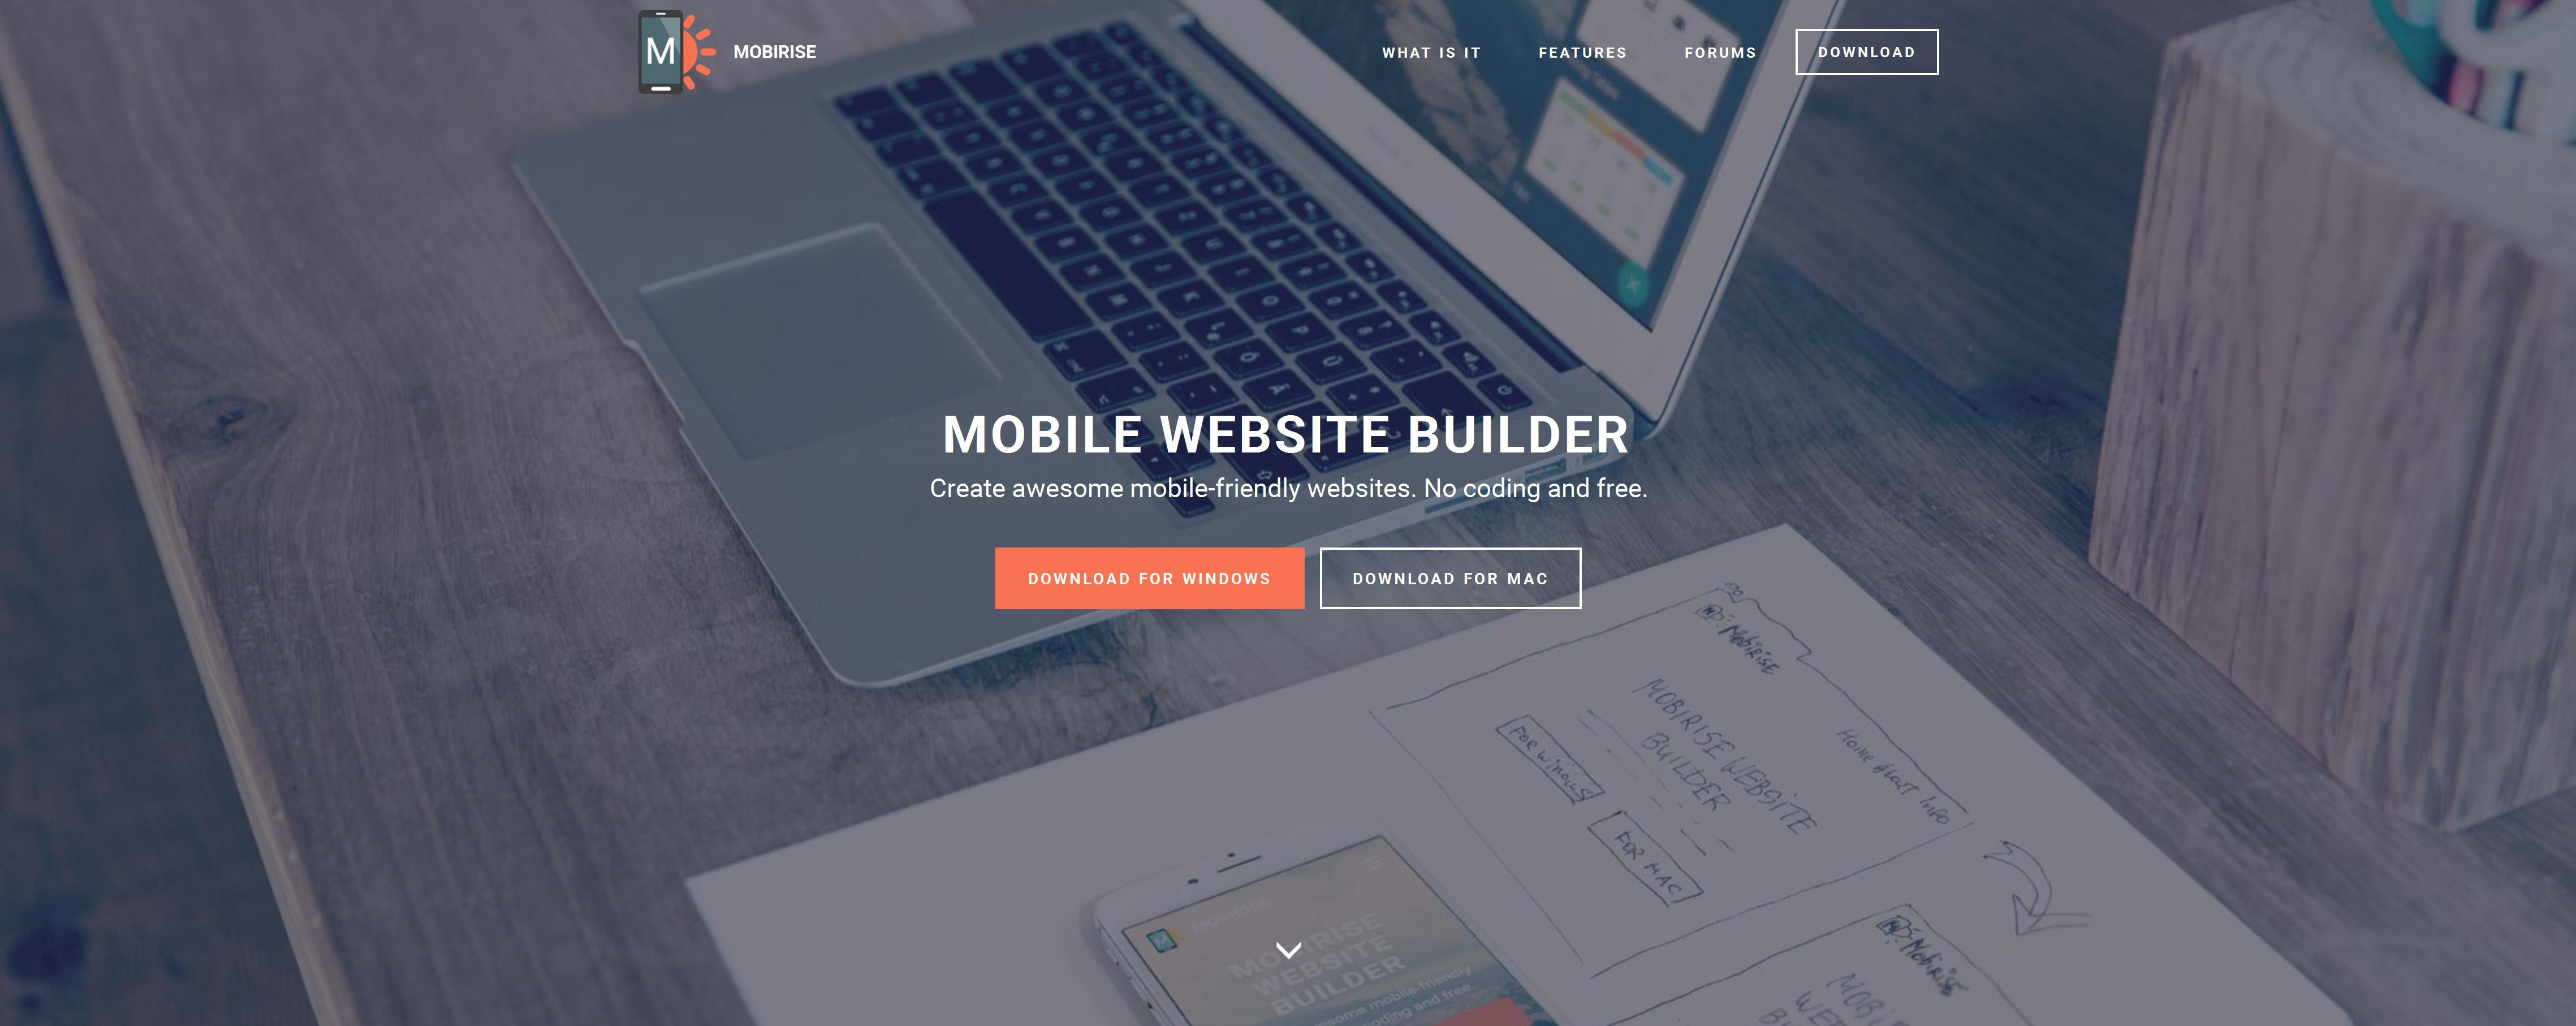 Best Mobile Website Builder Review